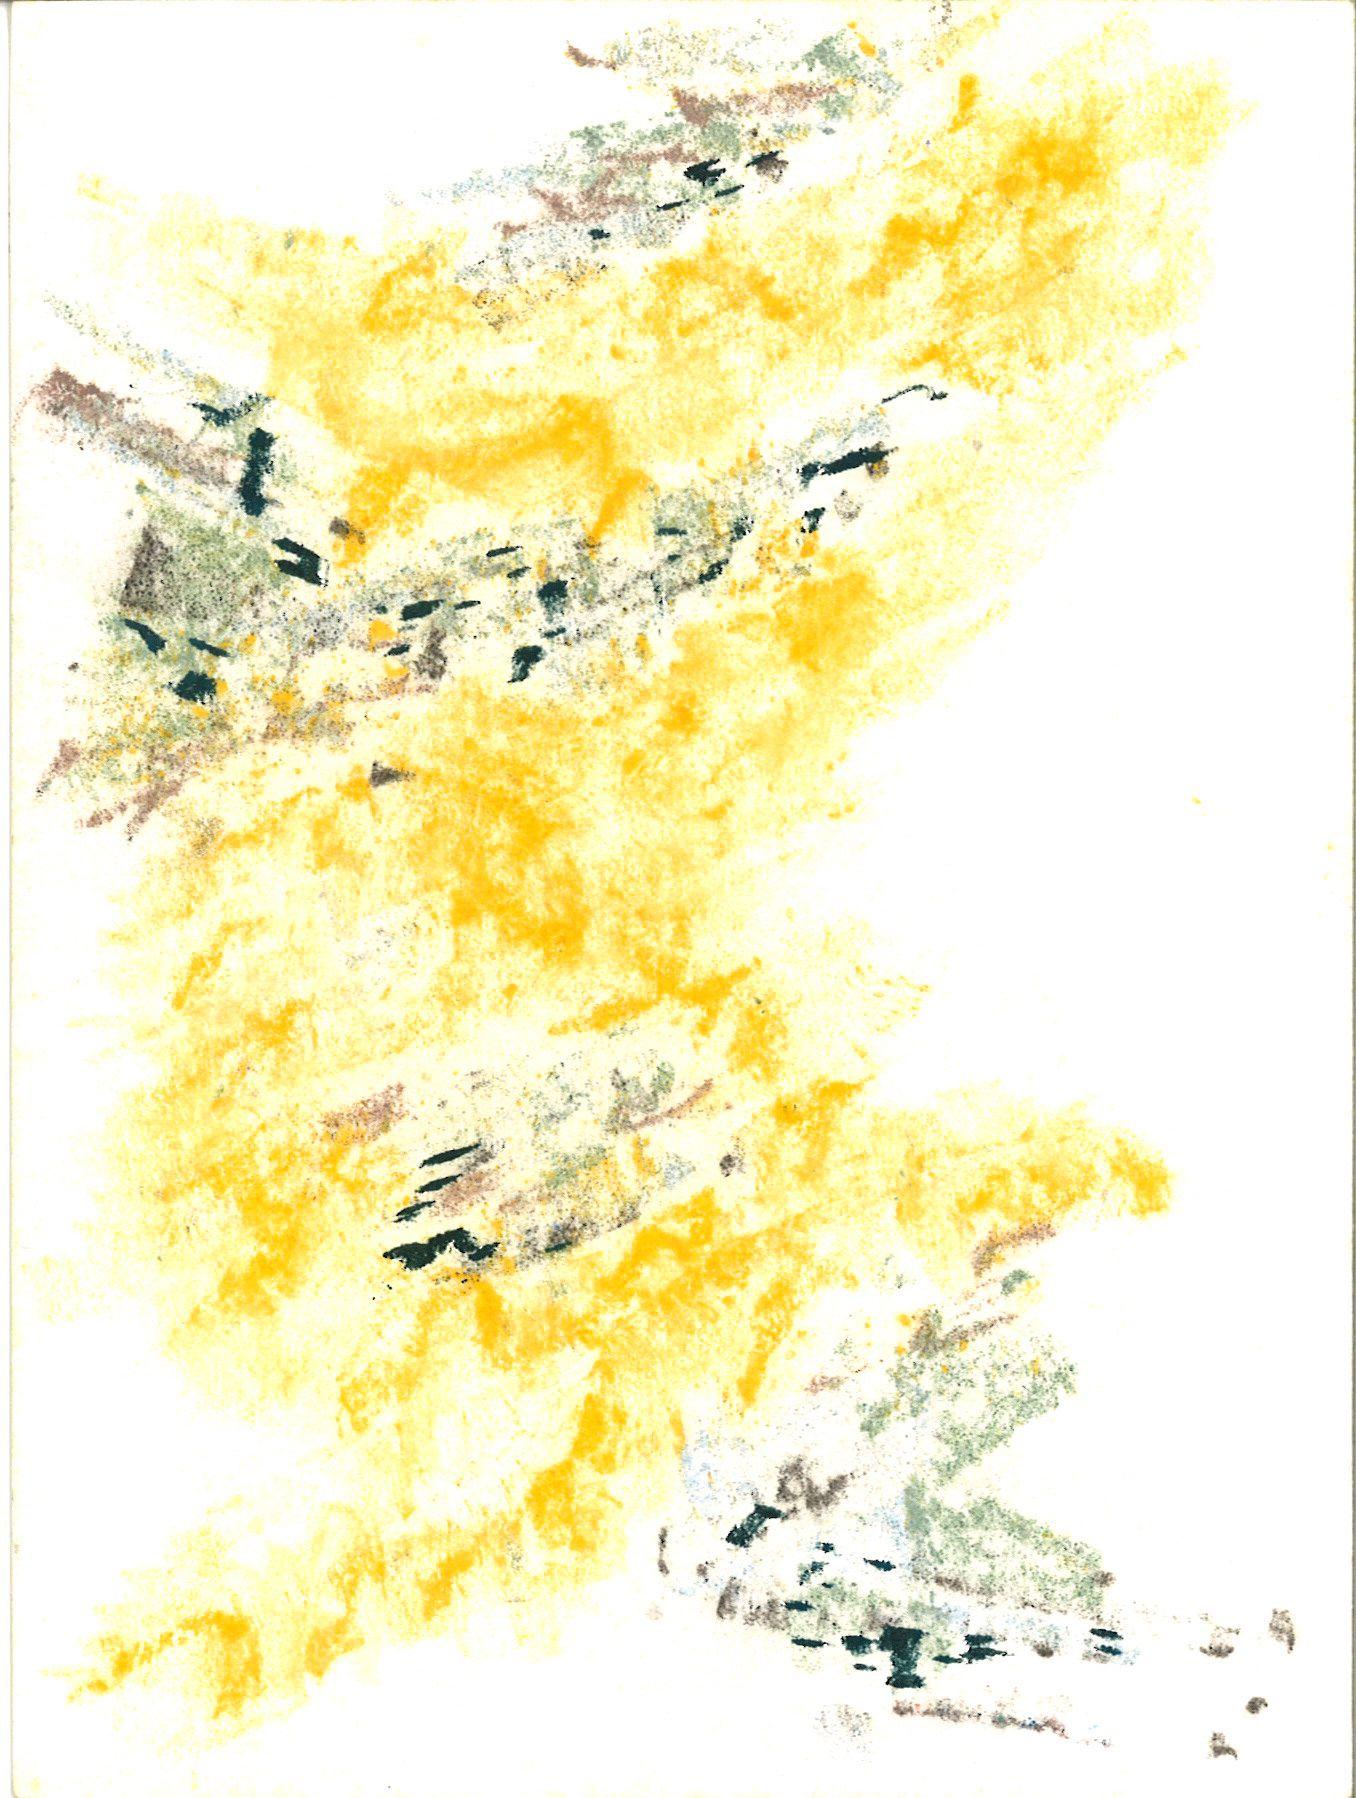 Catalytic art tarot card art abstract artwork artwork